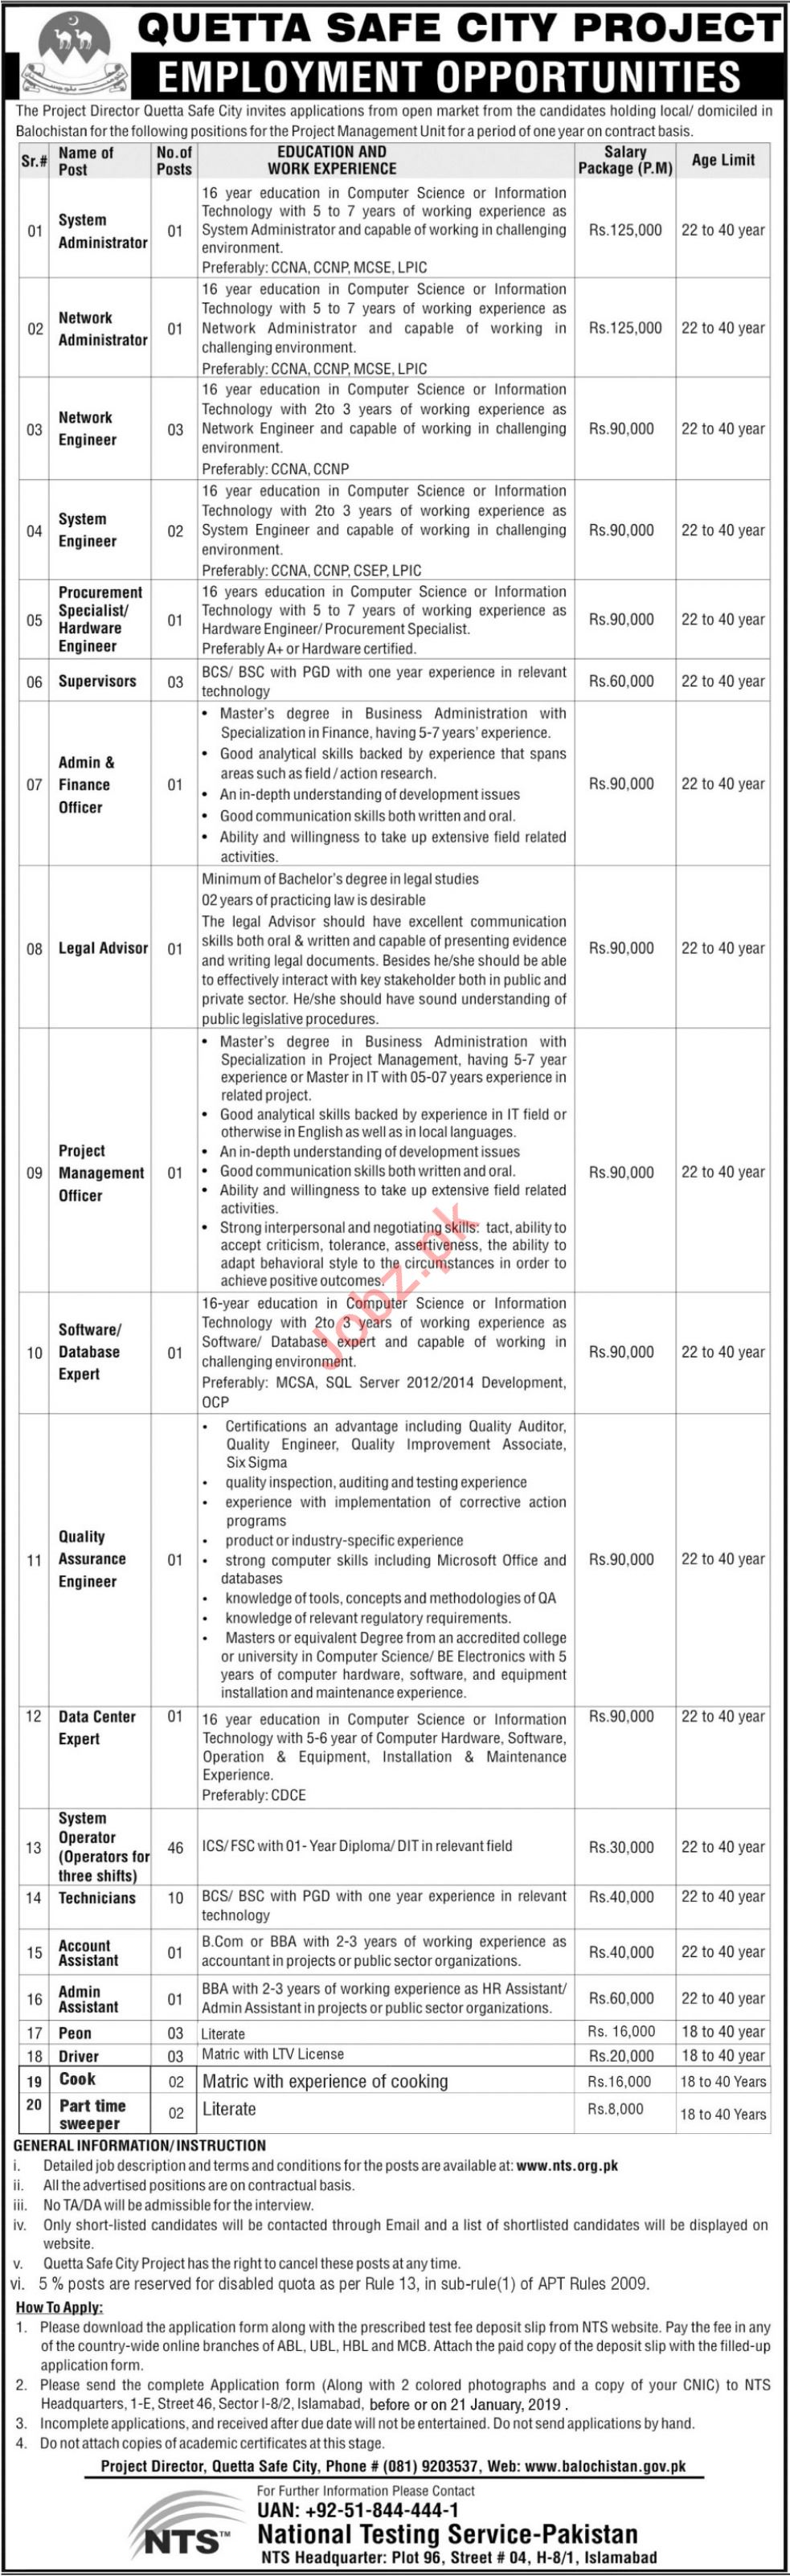 Quetta Safe City Project Employment Opportunities